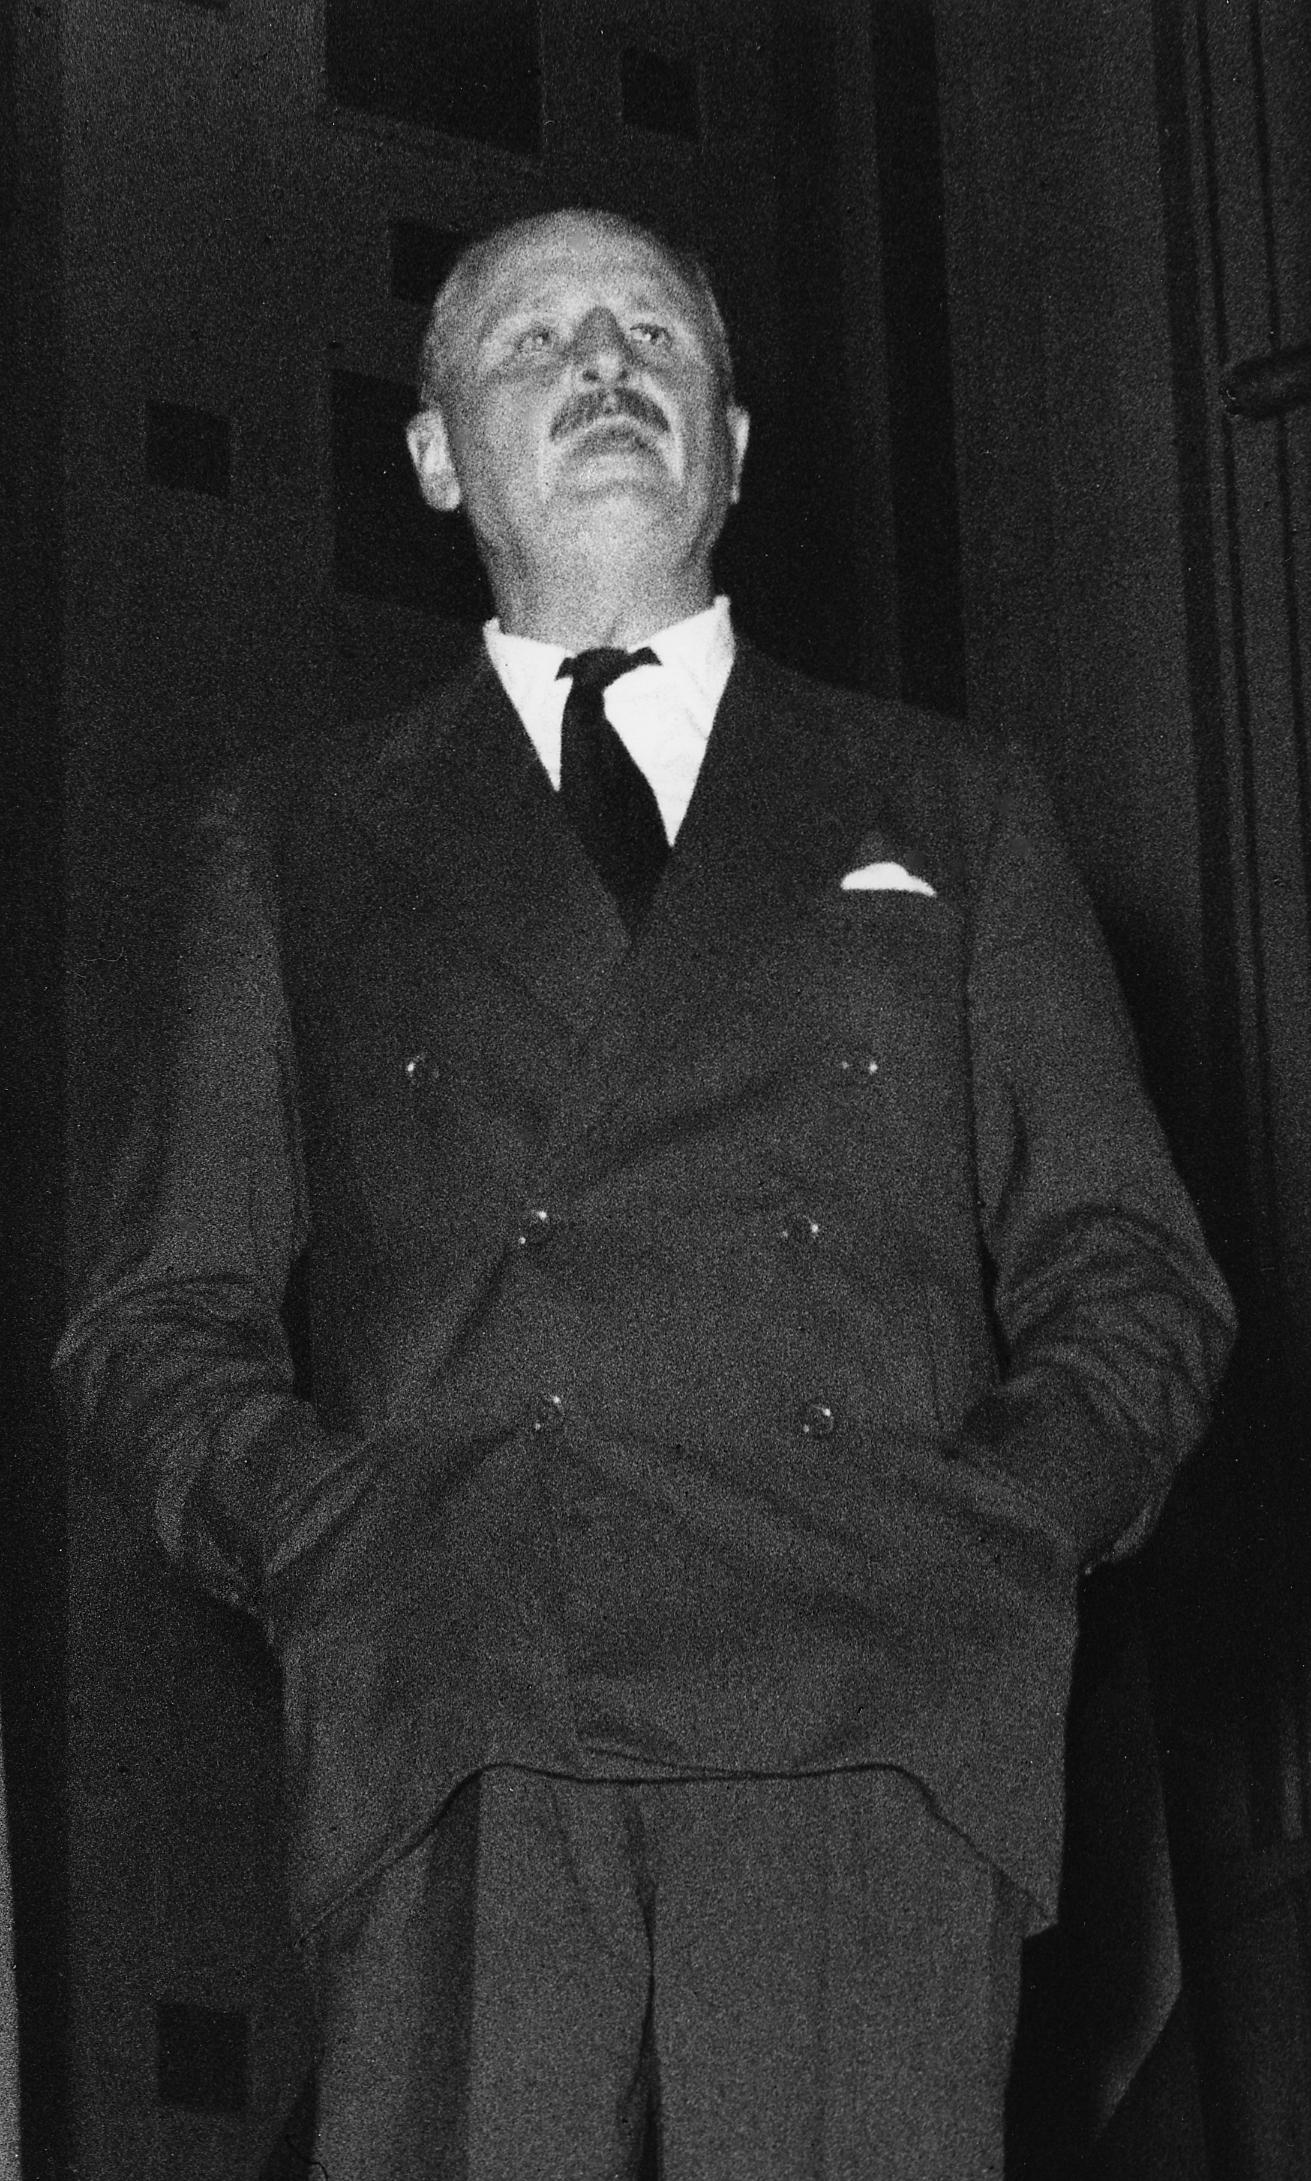 Oswald Mosely